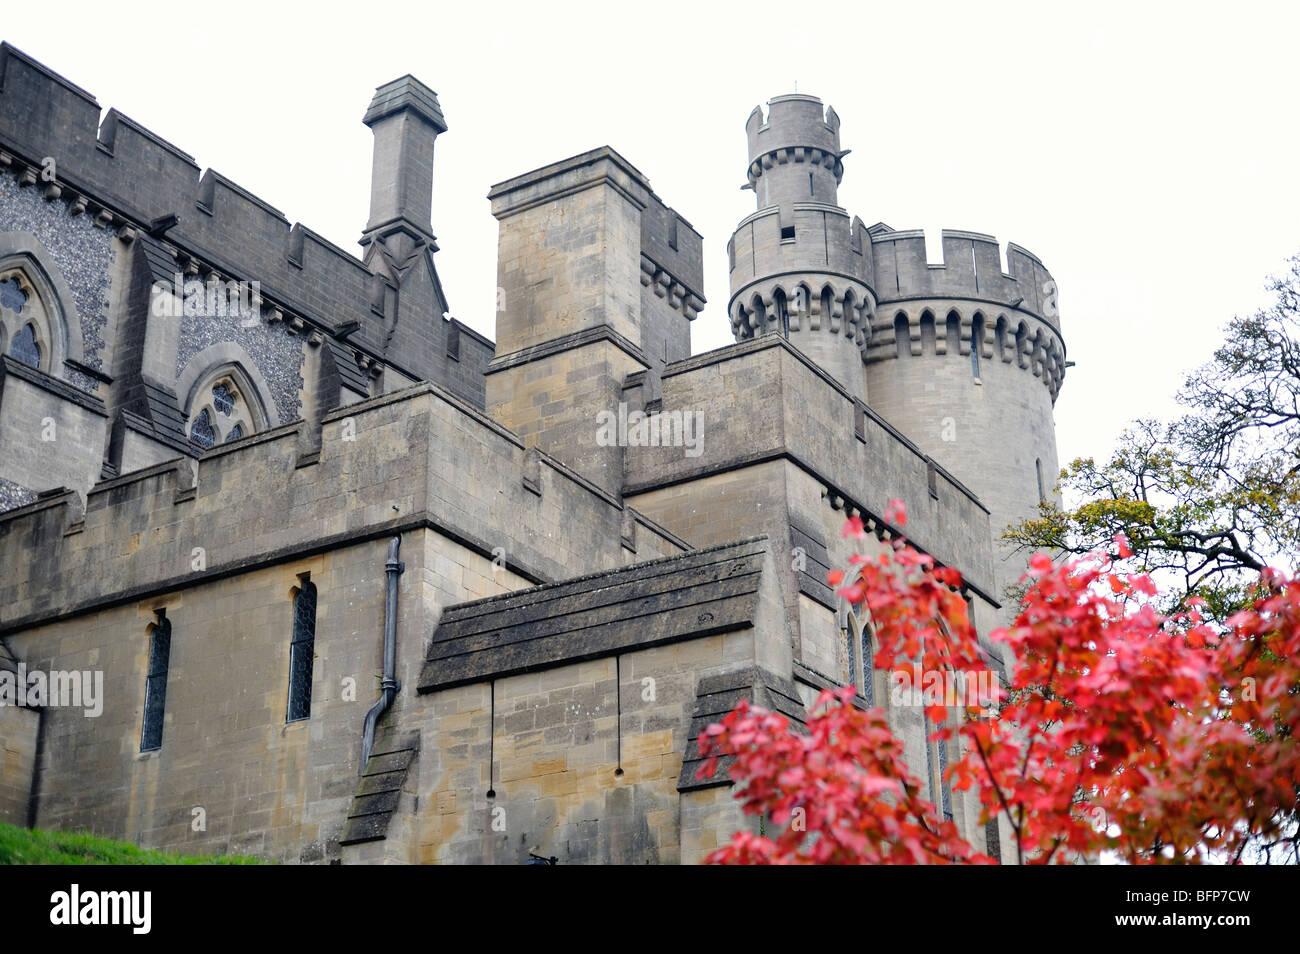 Arundel Castle turrets - Stock Image